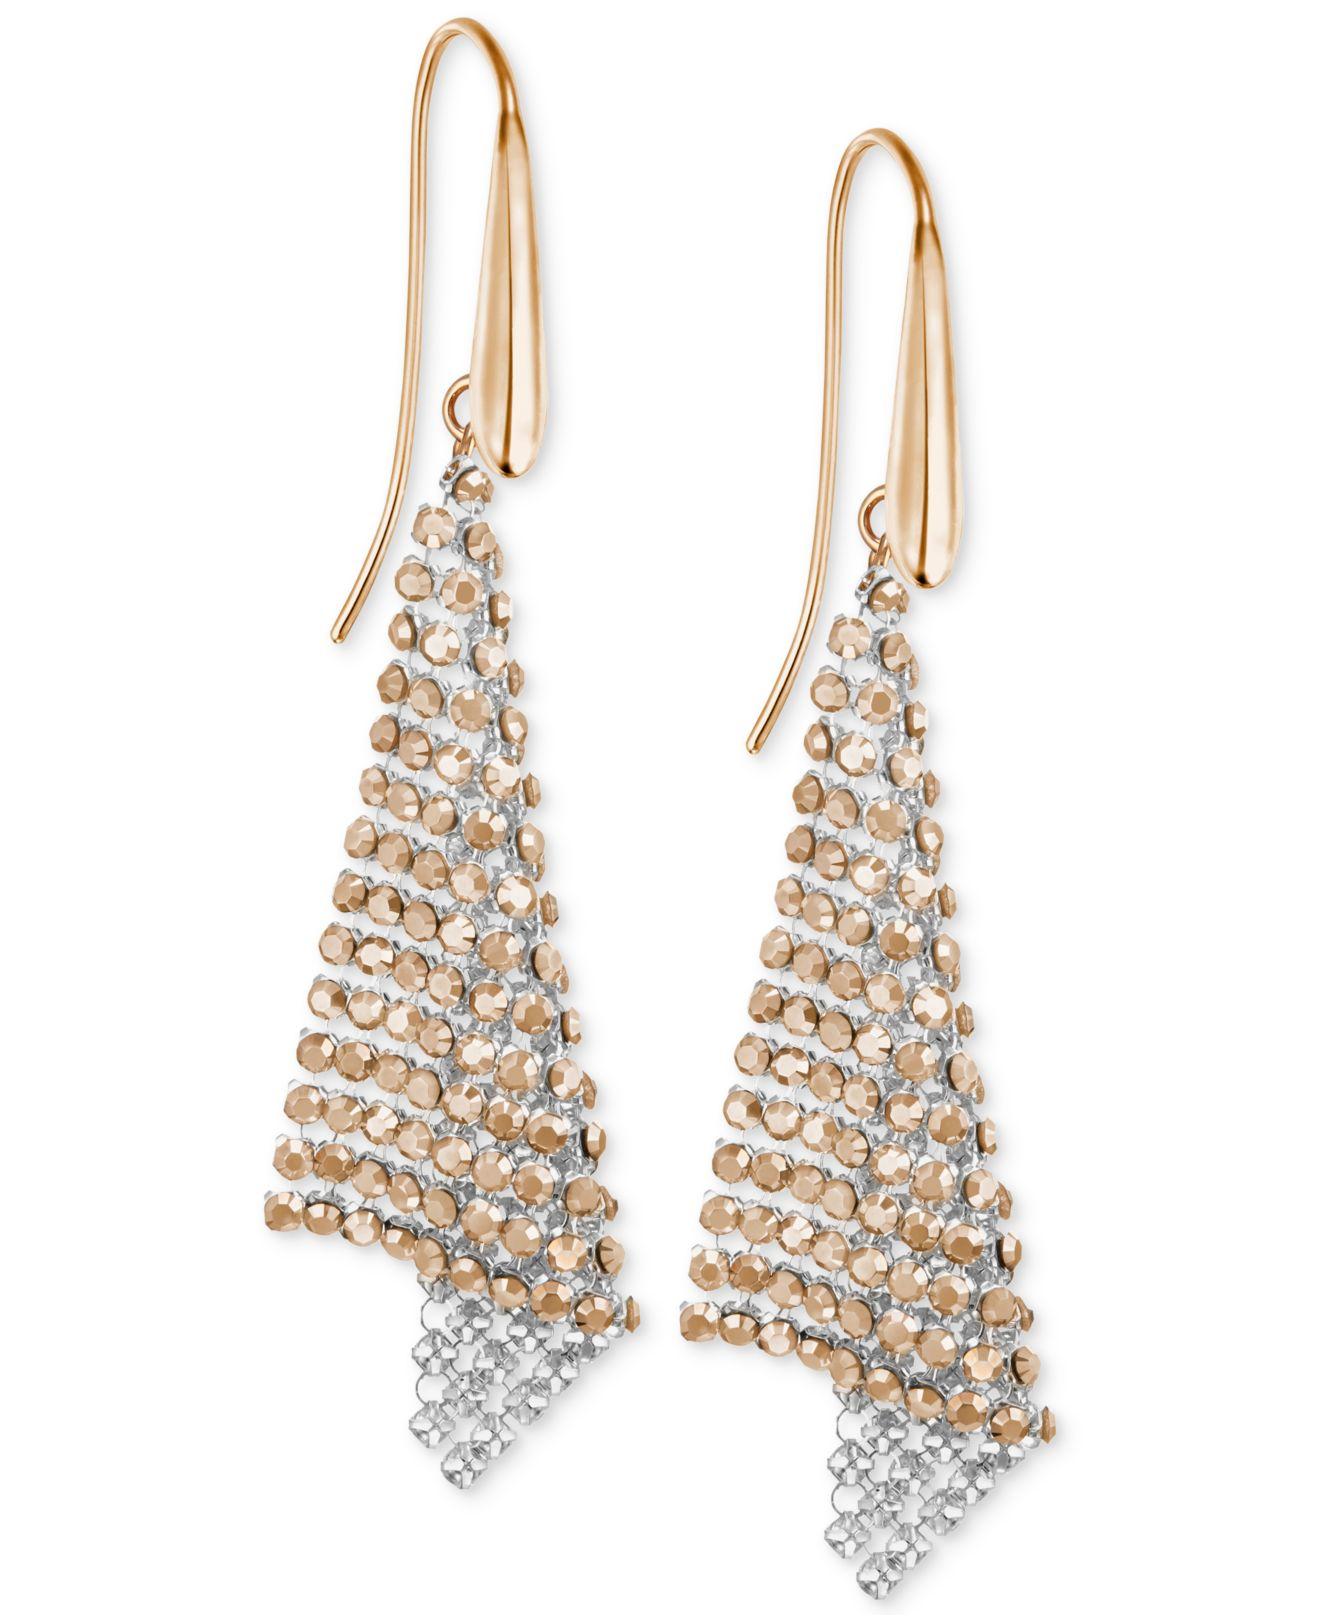 Lyst - Swarovski Rose Gold-tone Crystal Mesh Drop Earrings in Pink cdb20b46a4